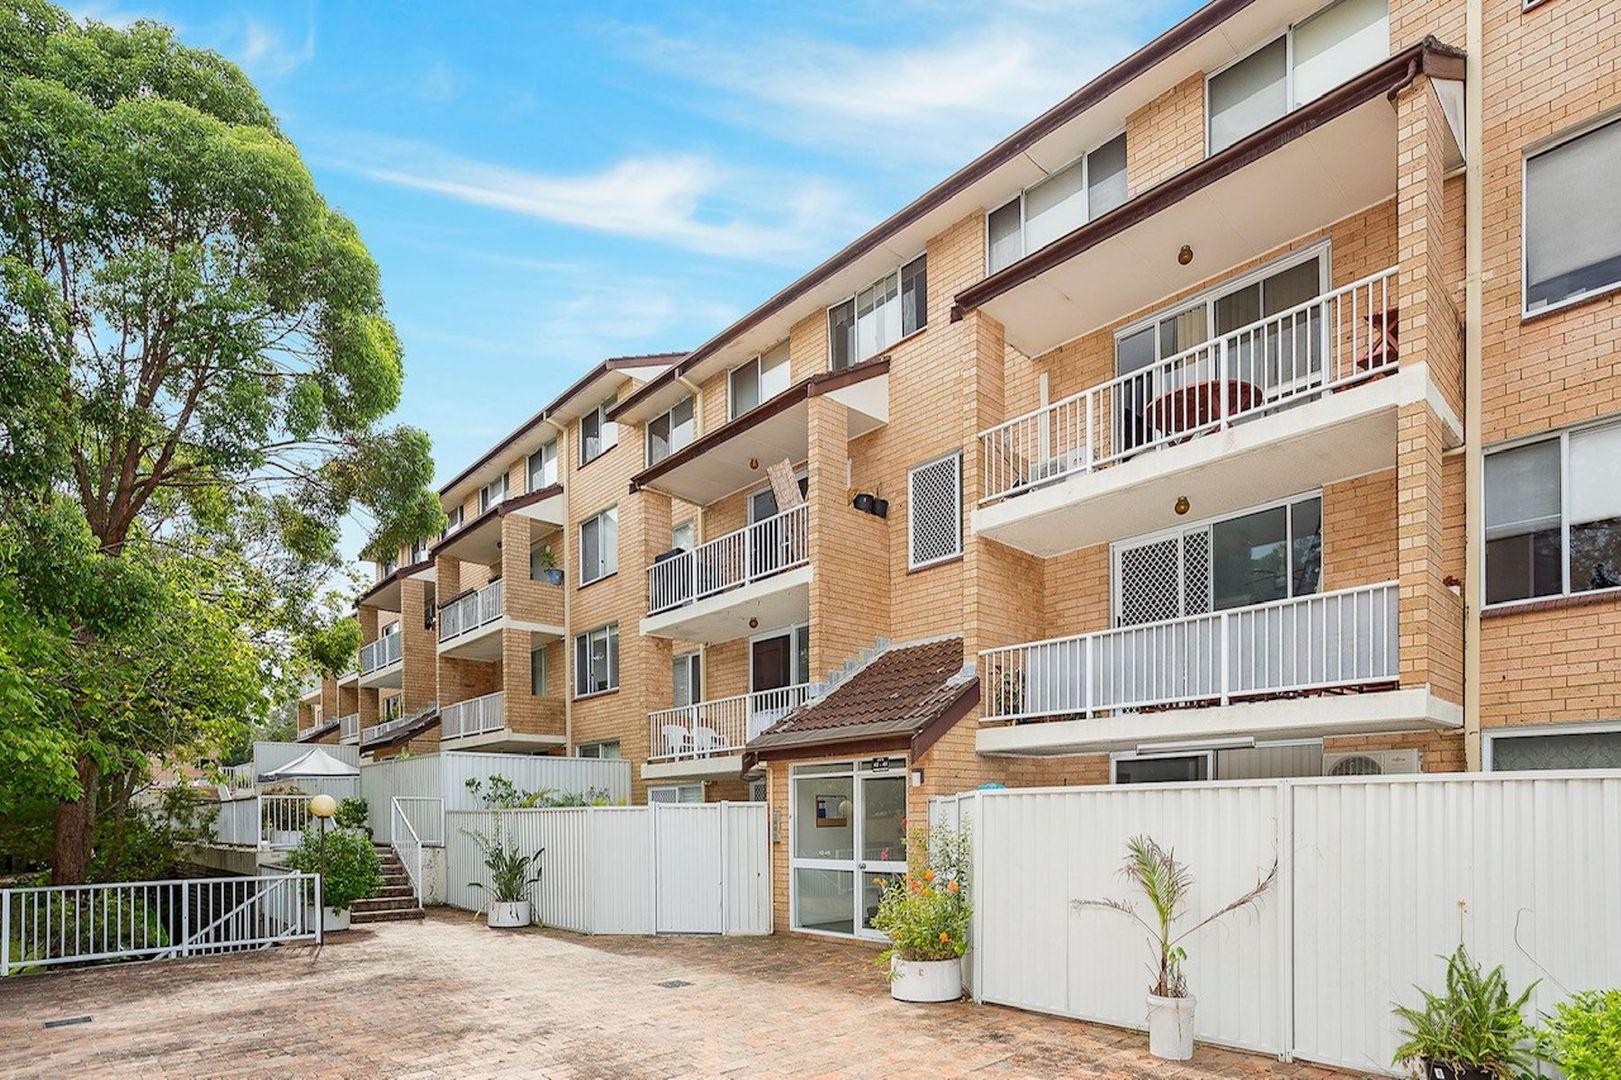 45/99-111 Karimbla Road, Miranda NSW 2228, Image 0